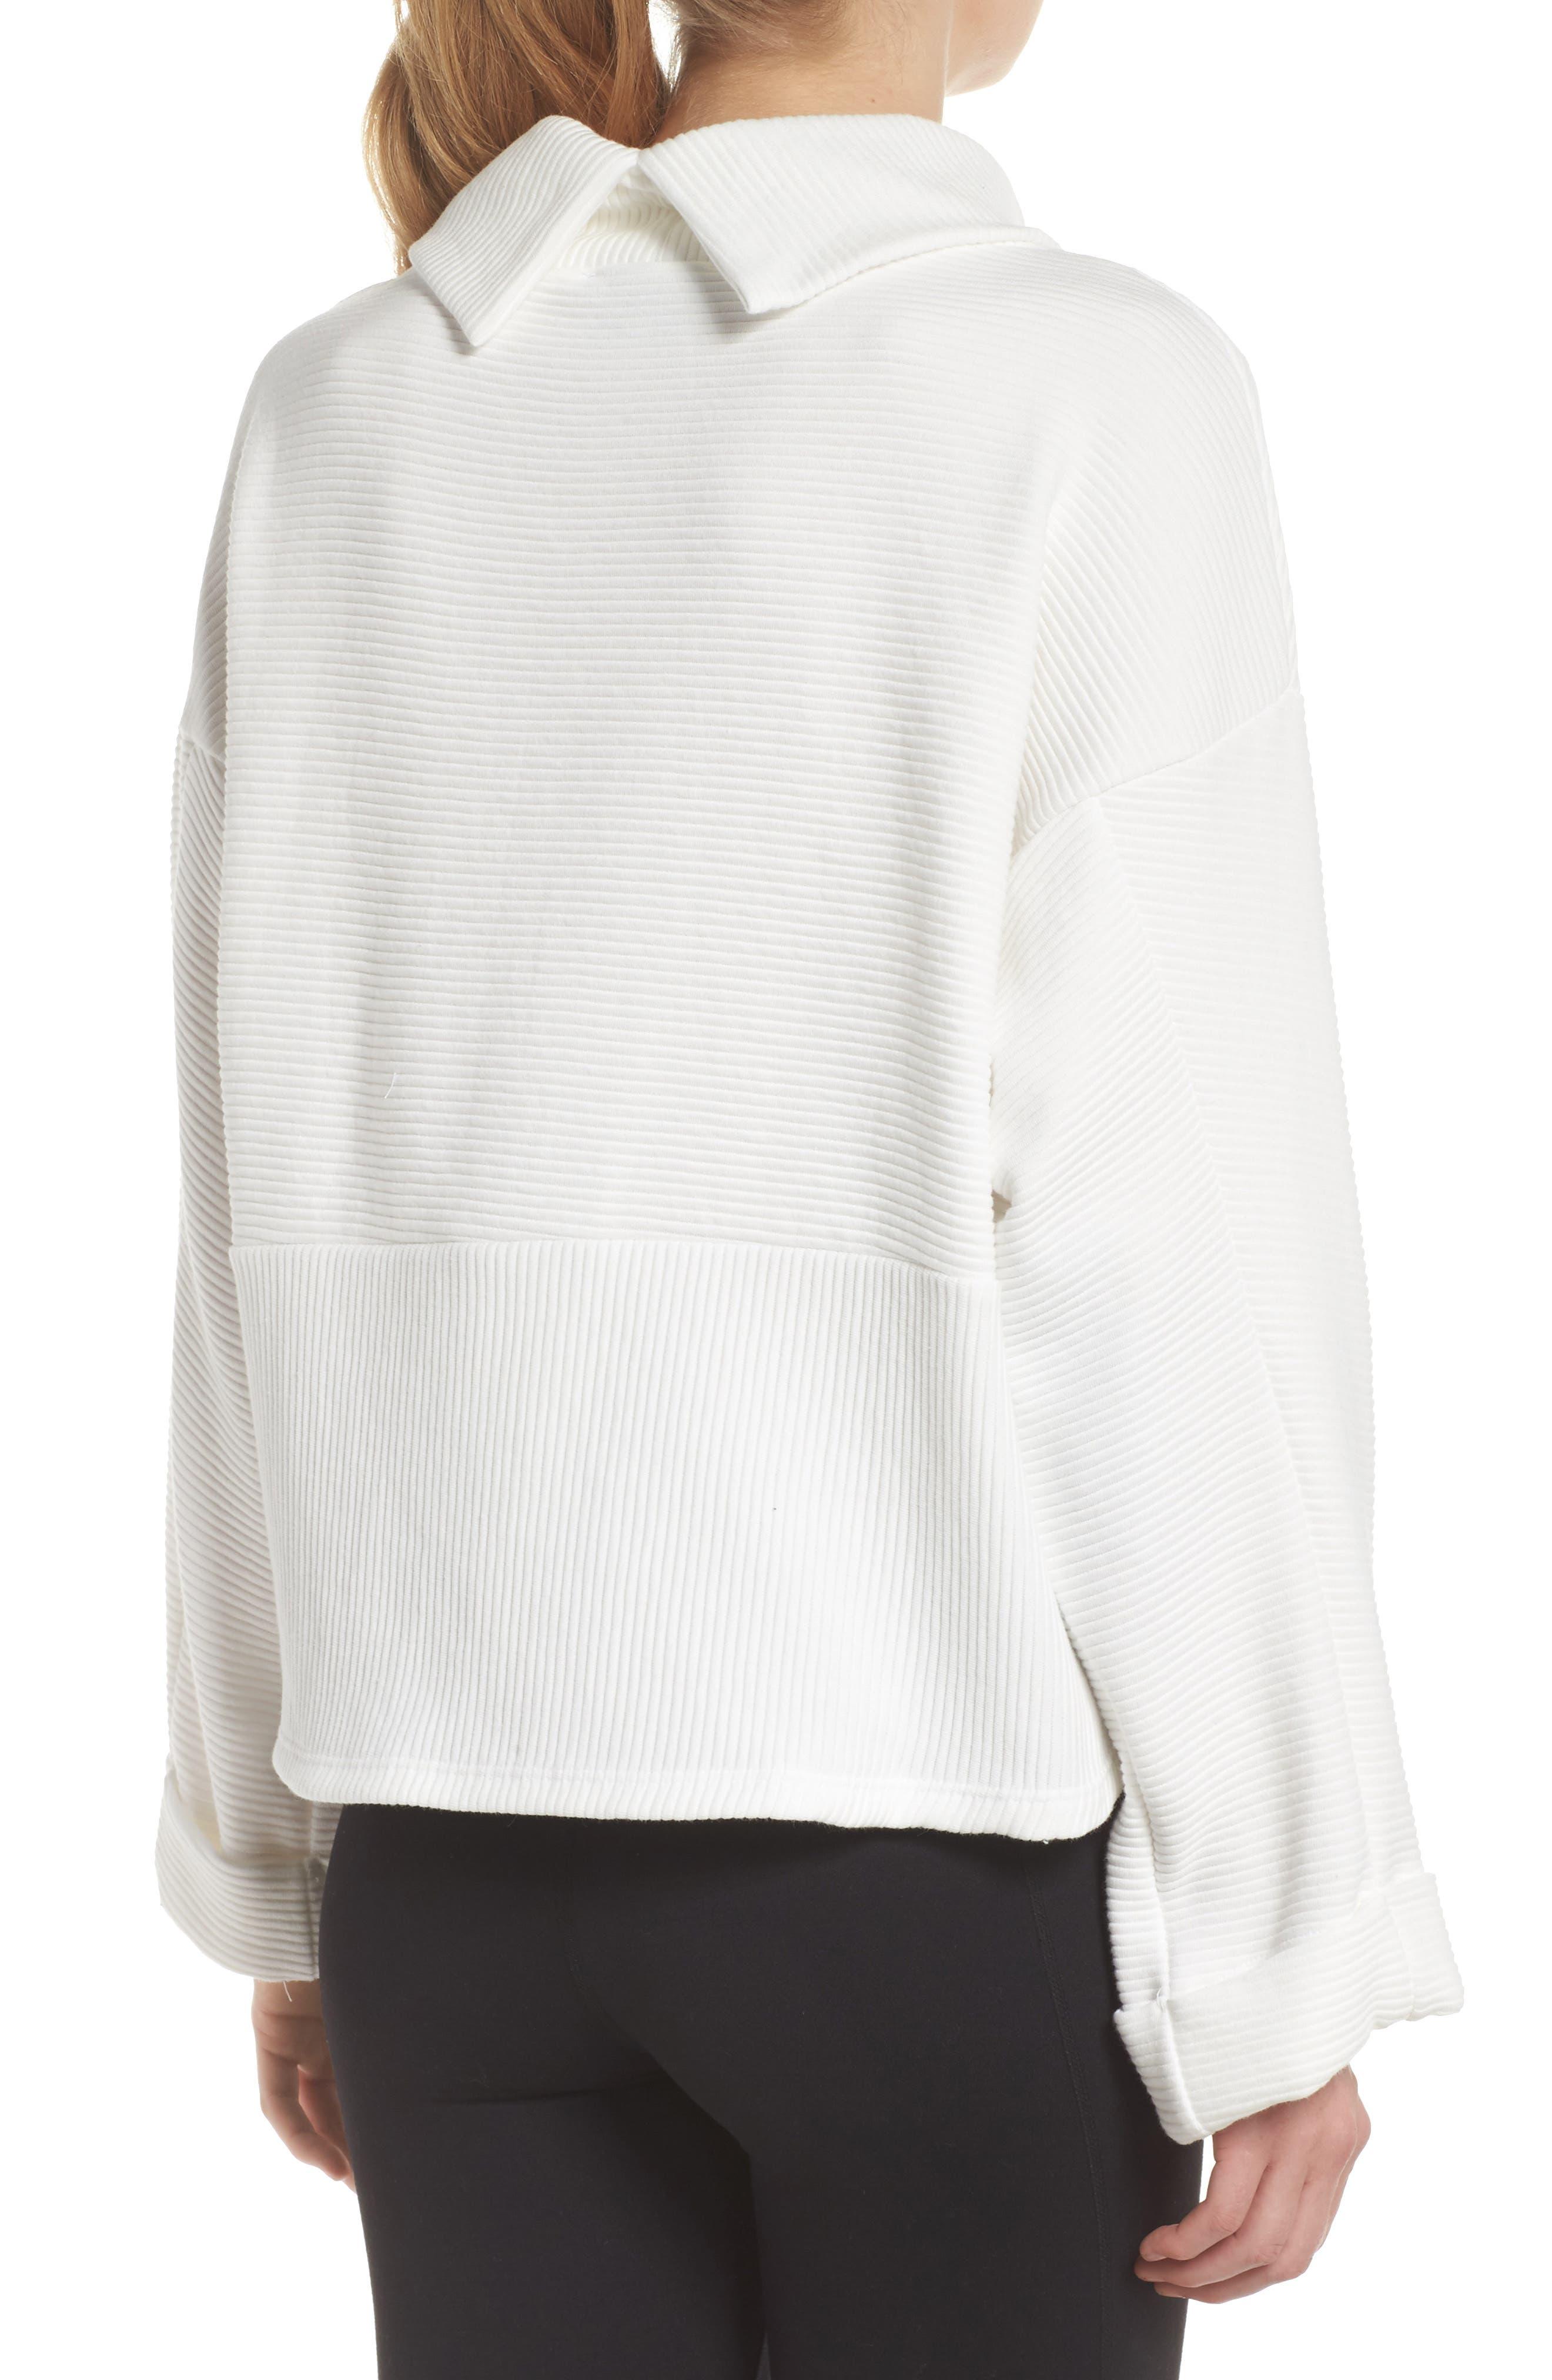 Whittier Sweatshirt,                             Alternate thumbnail 2, color,                             100